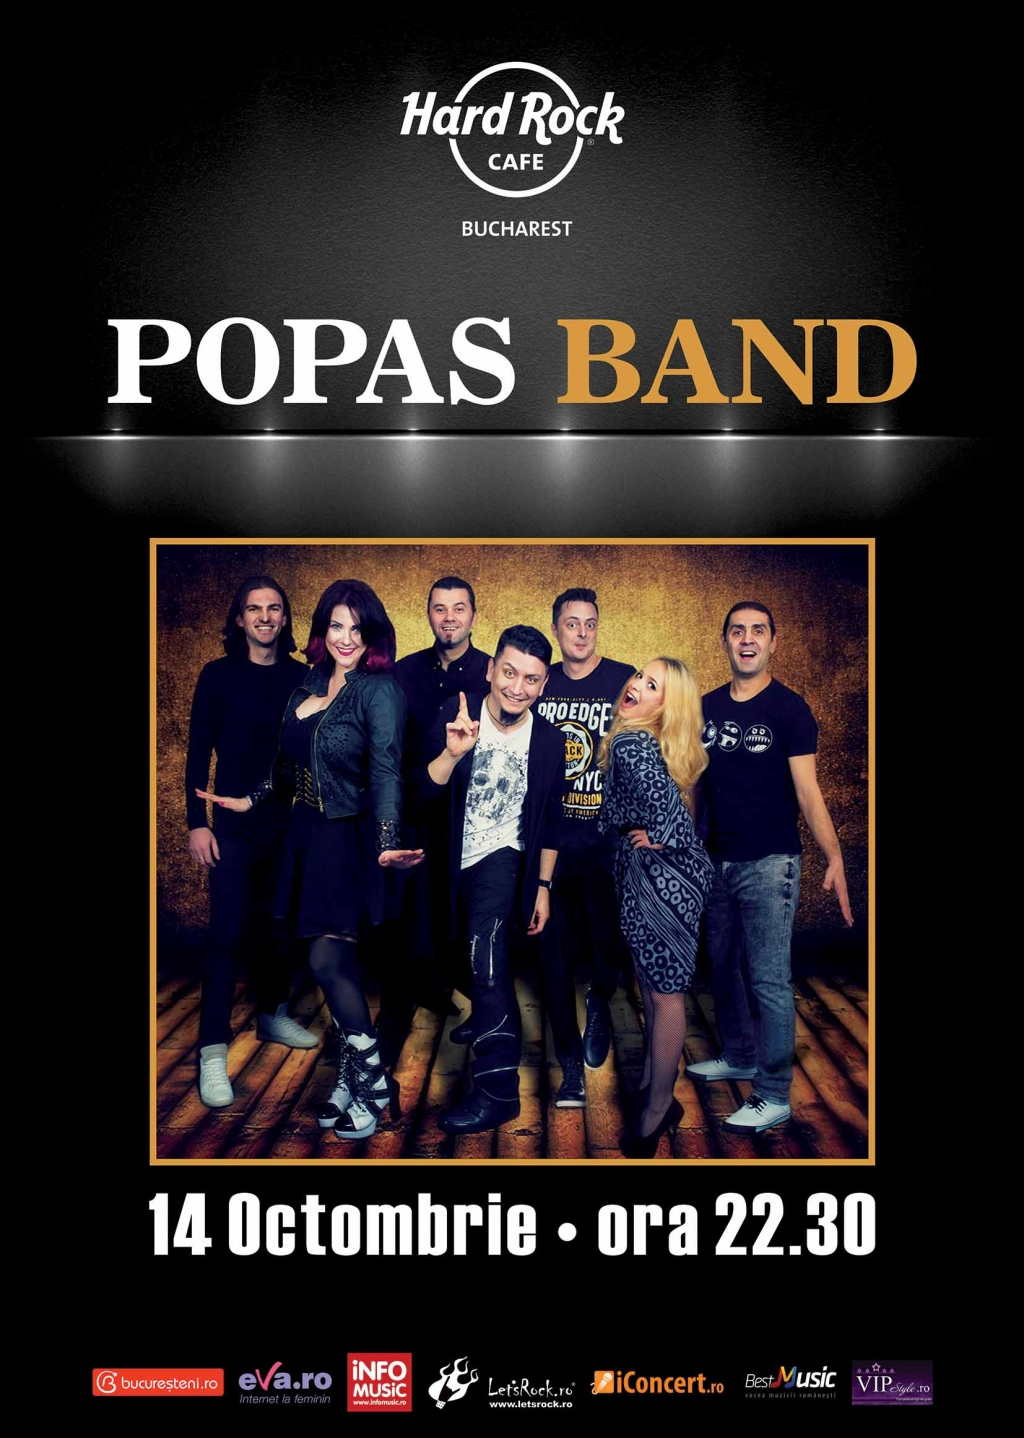 Popas Band concerteaza la Hard Rock Cafe pe 14 octombrie